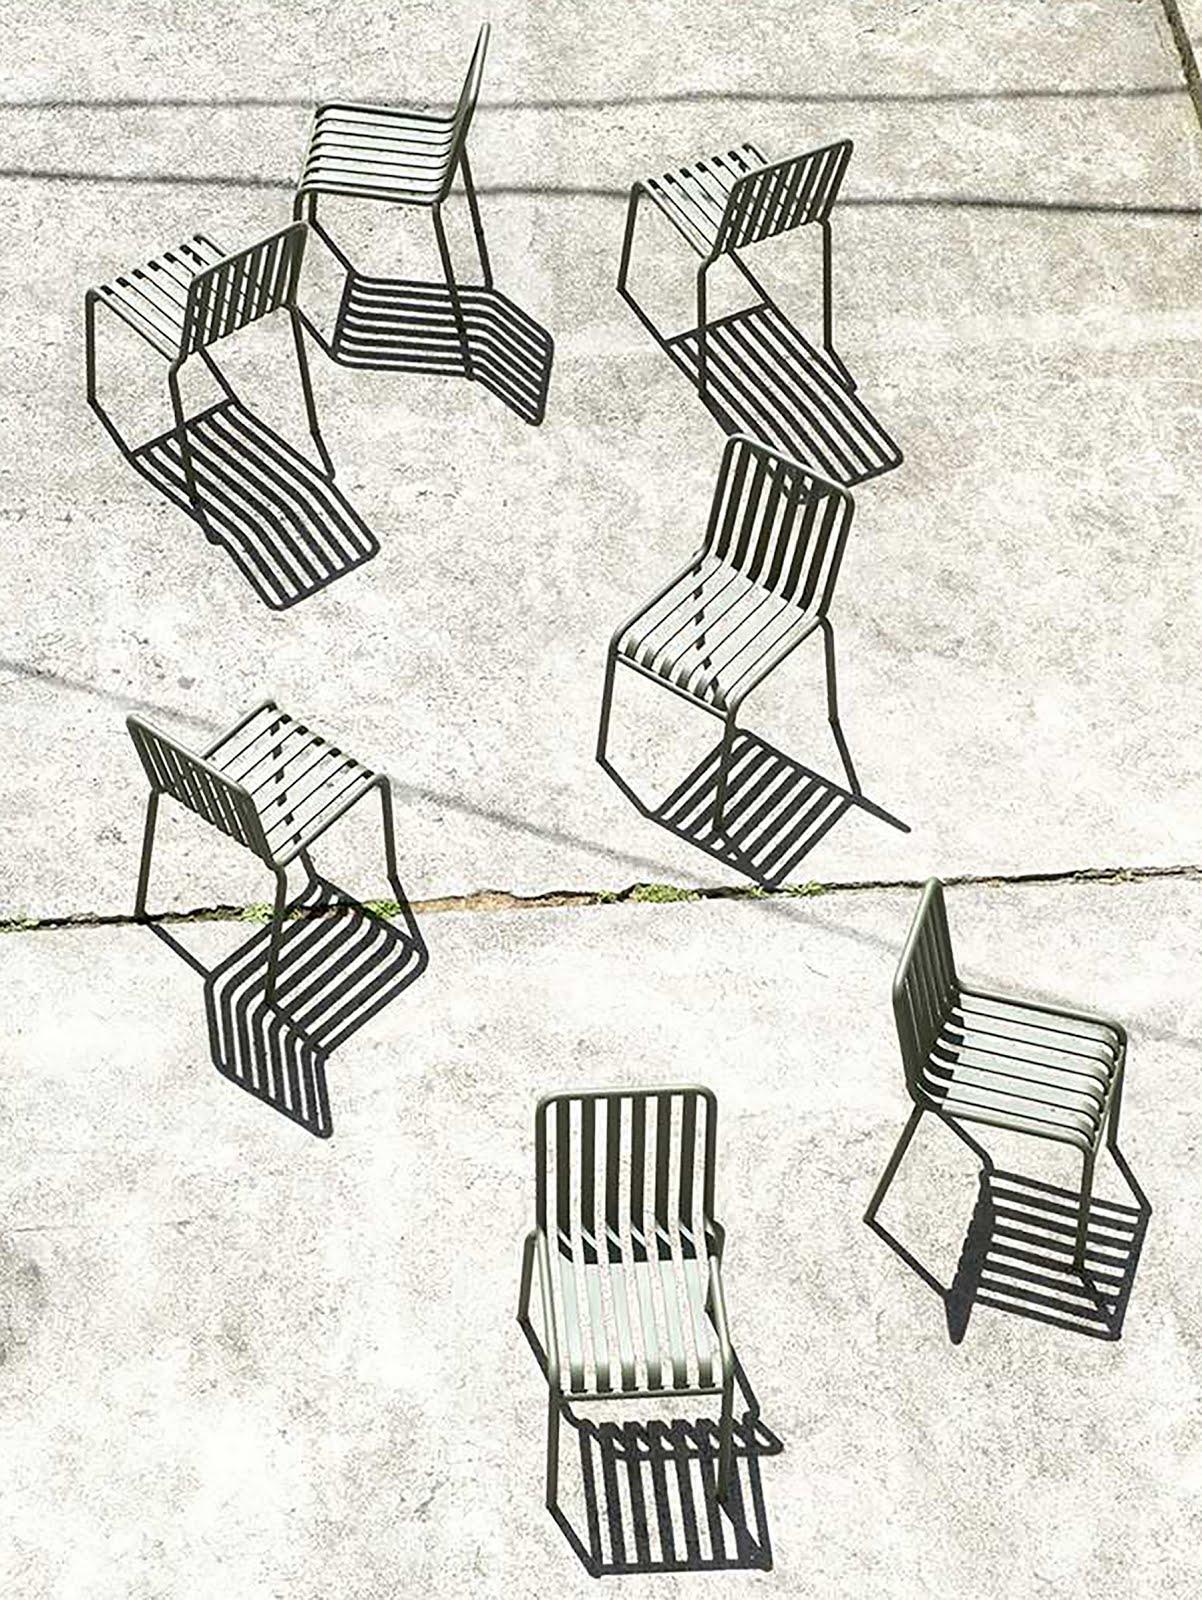 Hay chairs, mister design, hay stoelen, designer stoelen, hay hee, dapper, result, interieur design, soft edge, j104